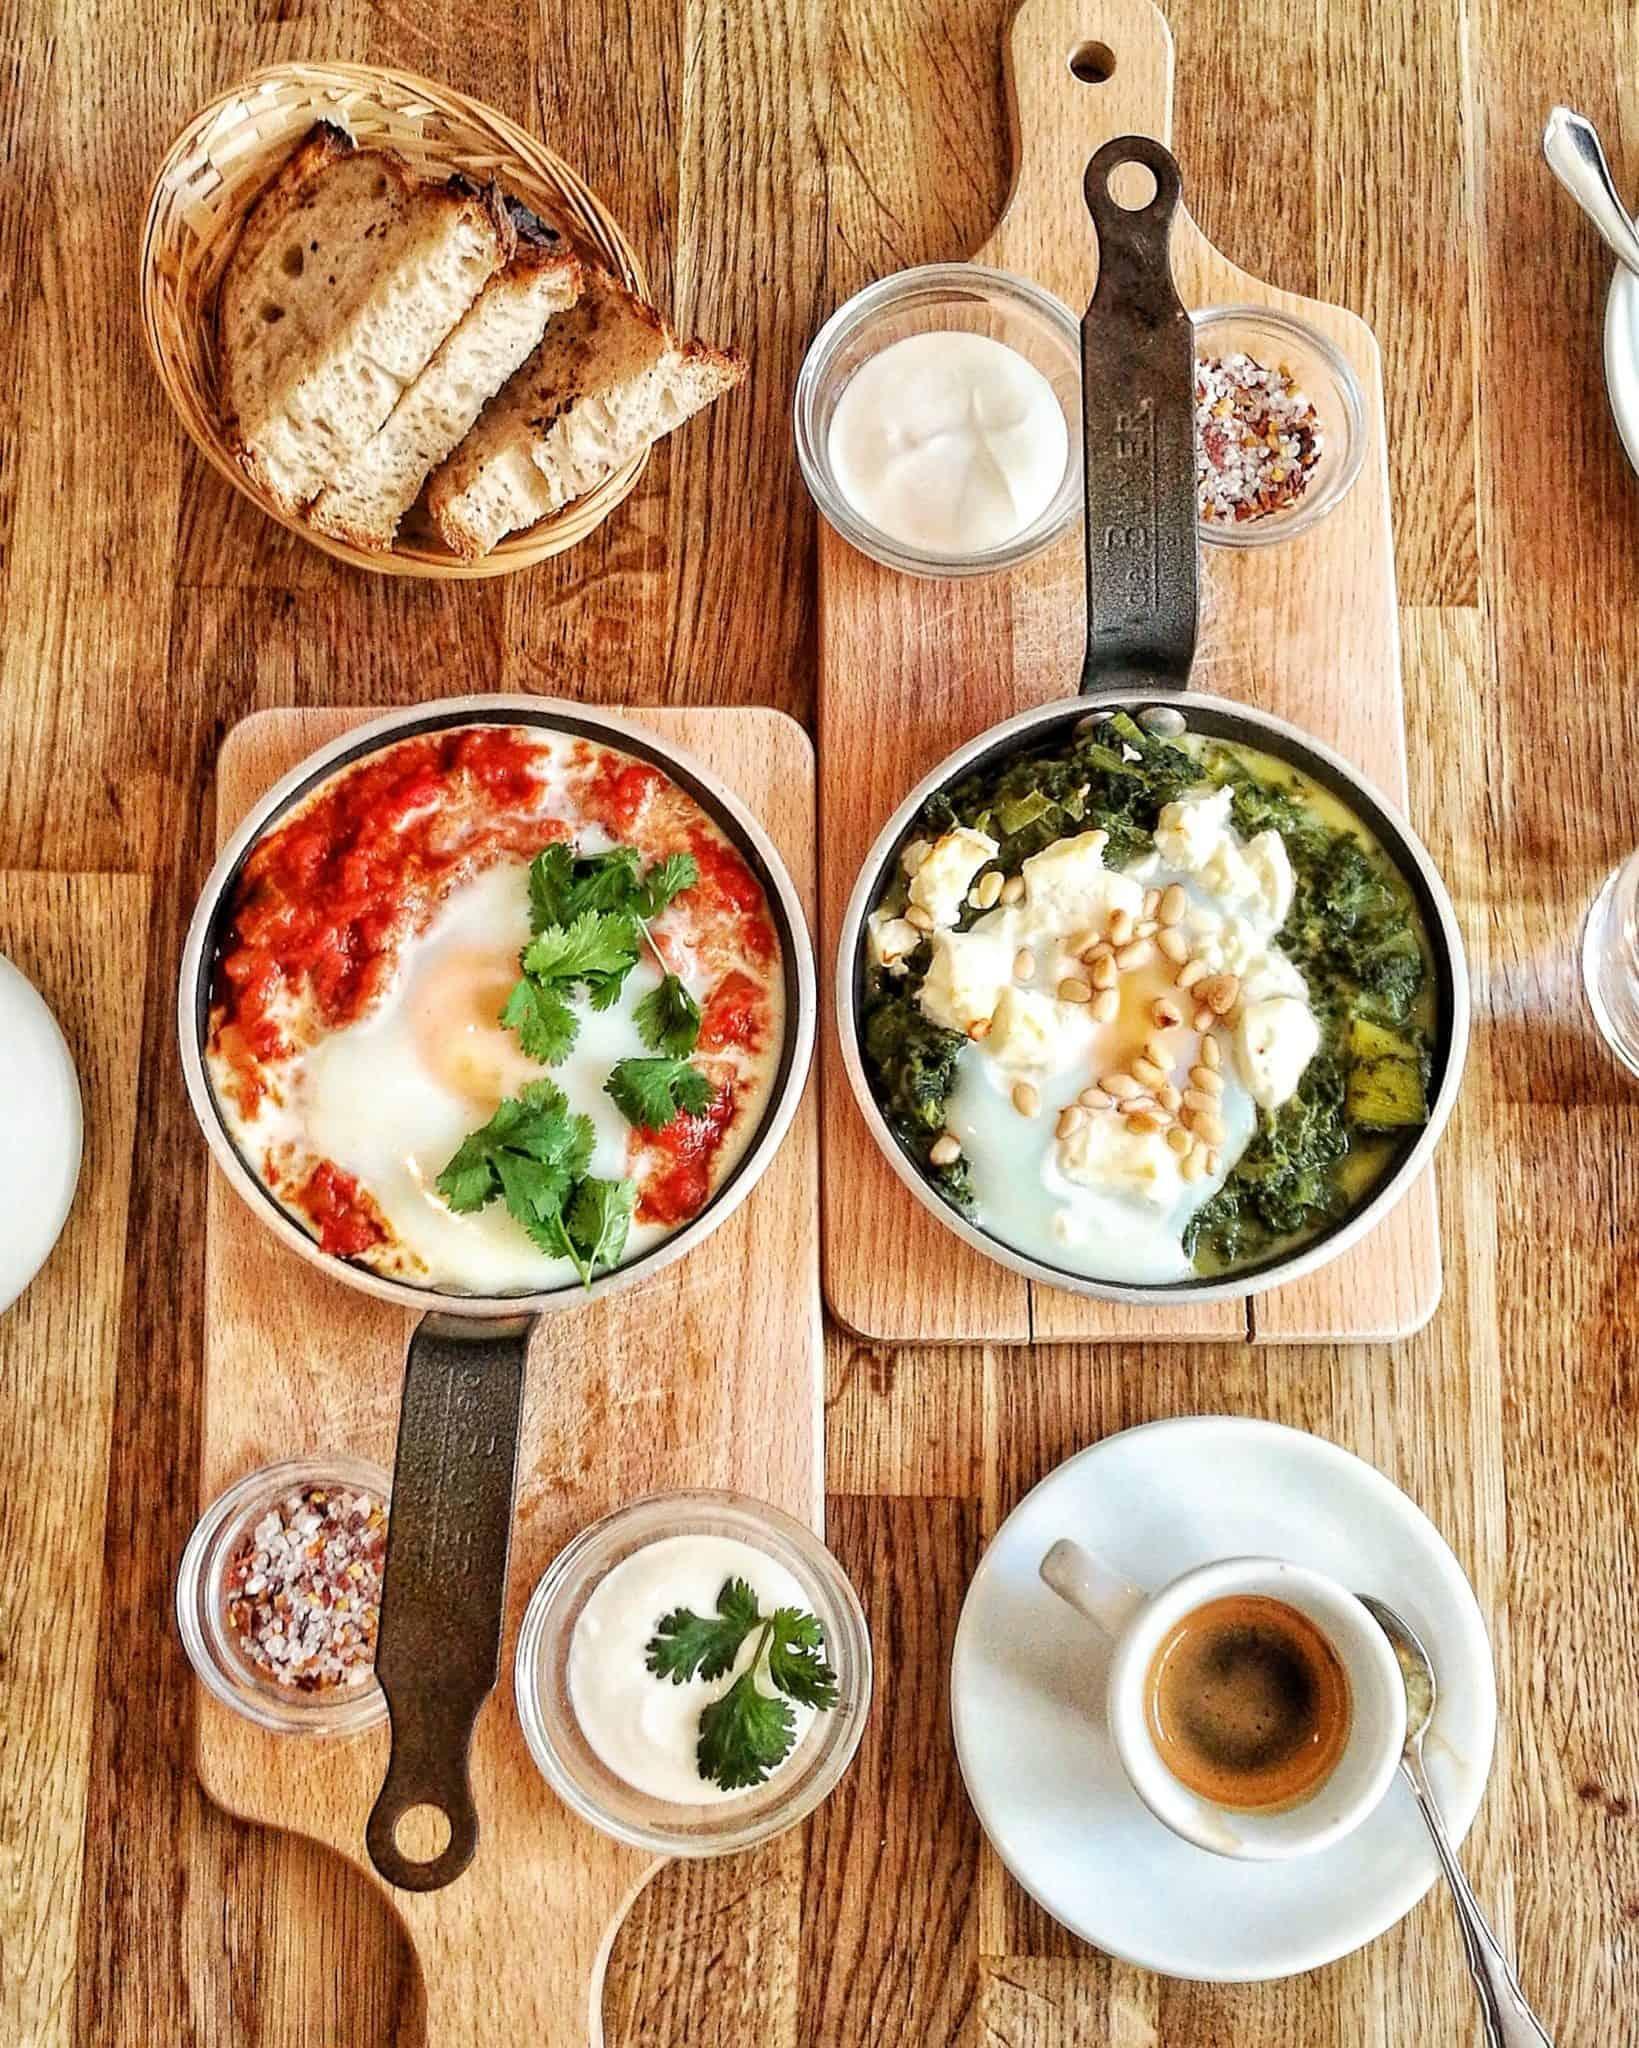 cafe oberkampf review